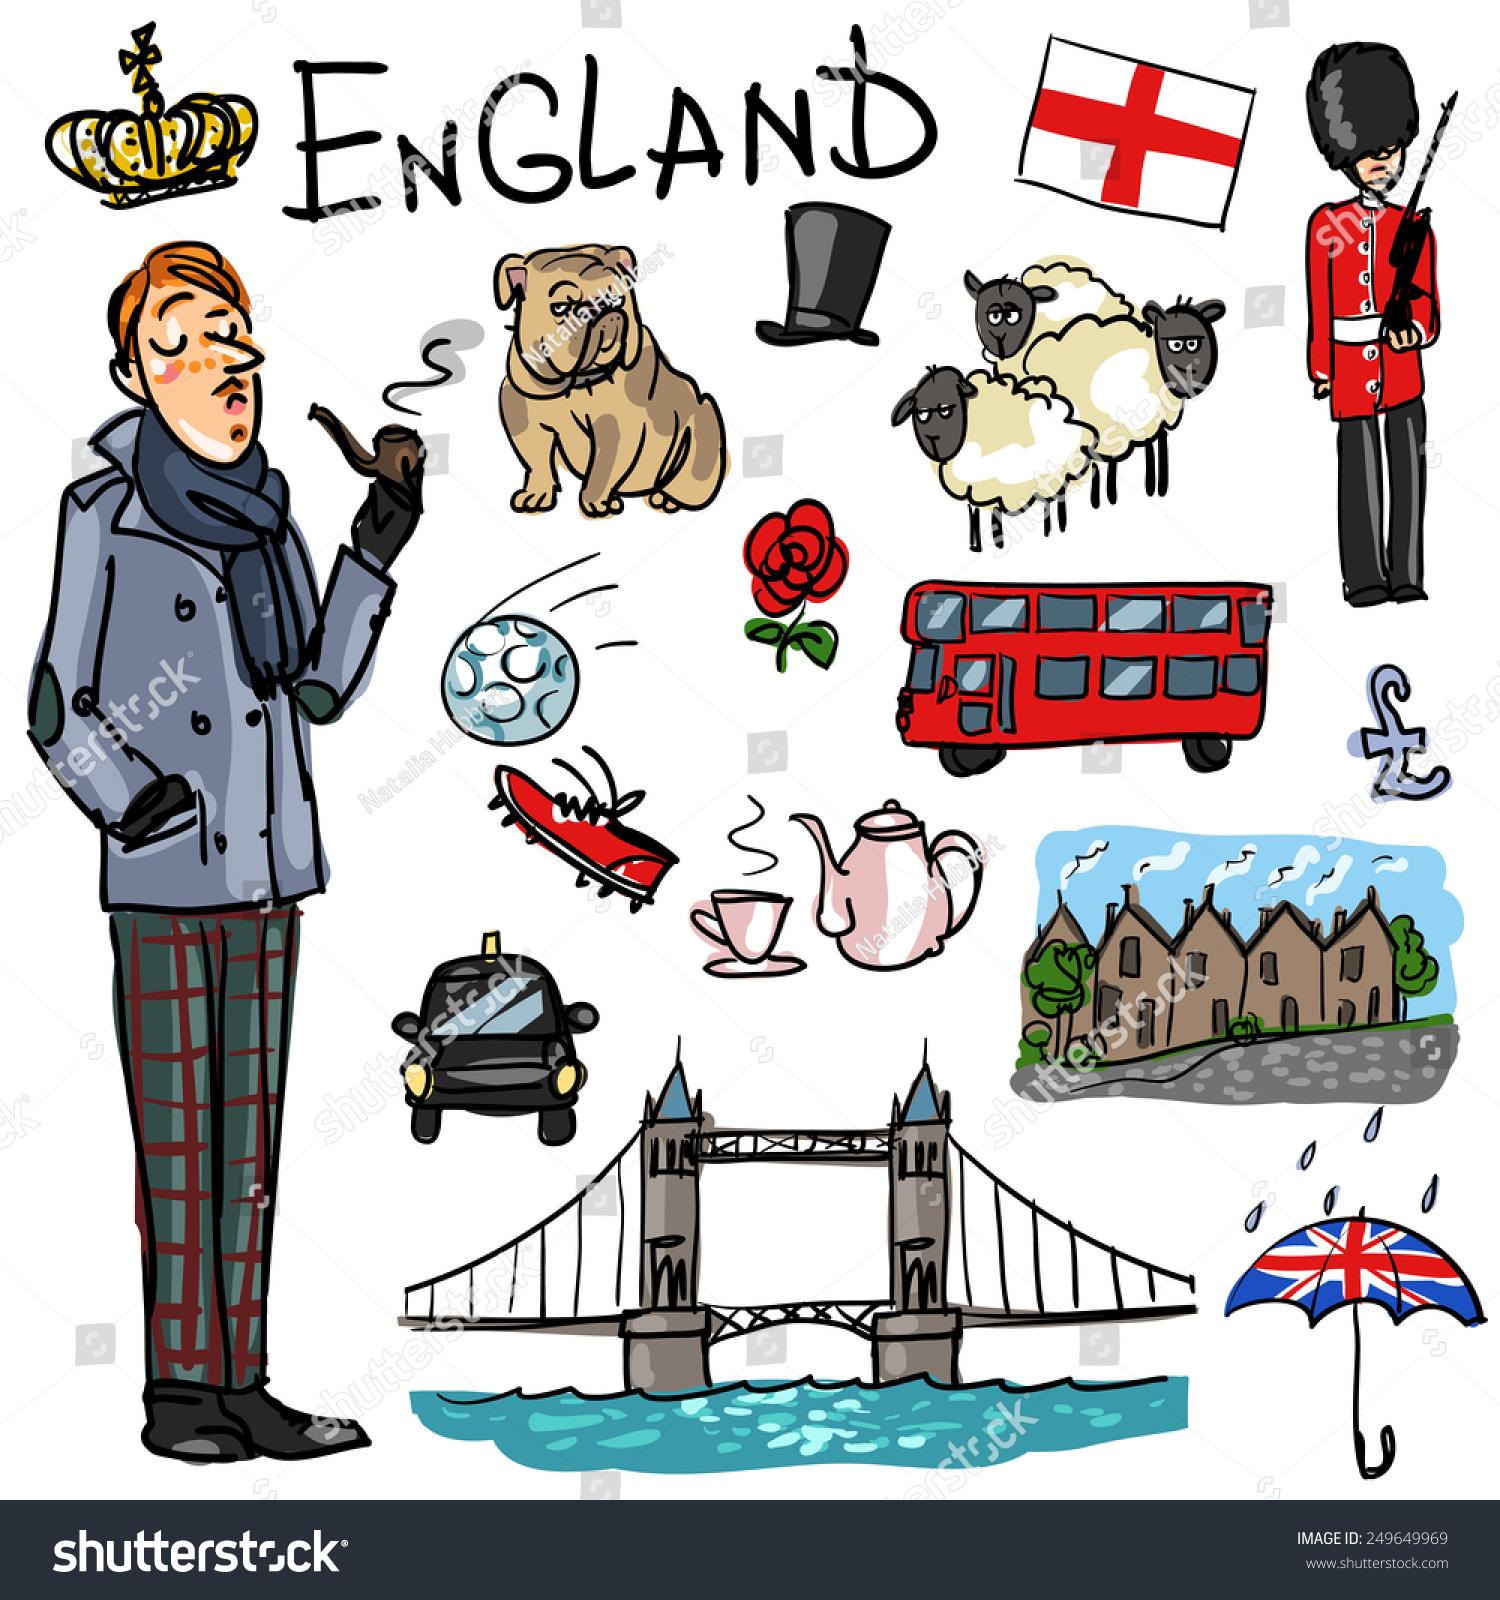 England Cartoon Collection Stock-Vektorgrafik (Lizenzfrei) 249649969 ...